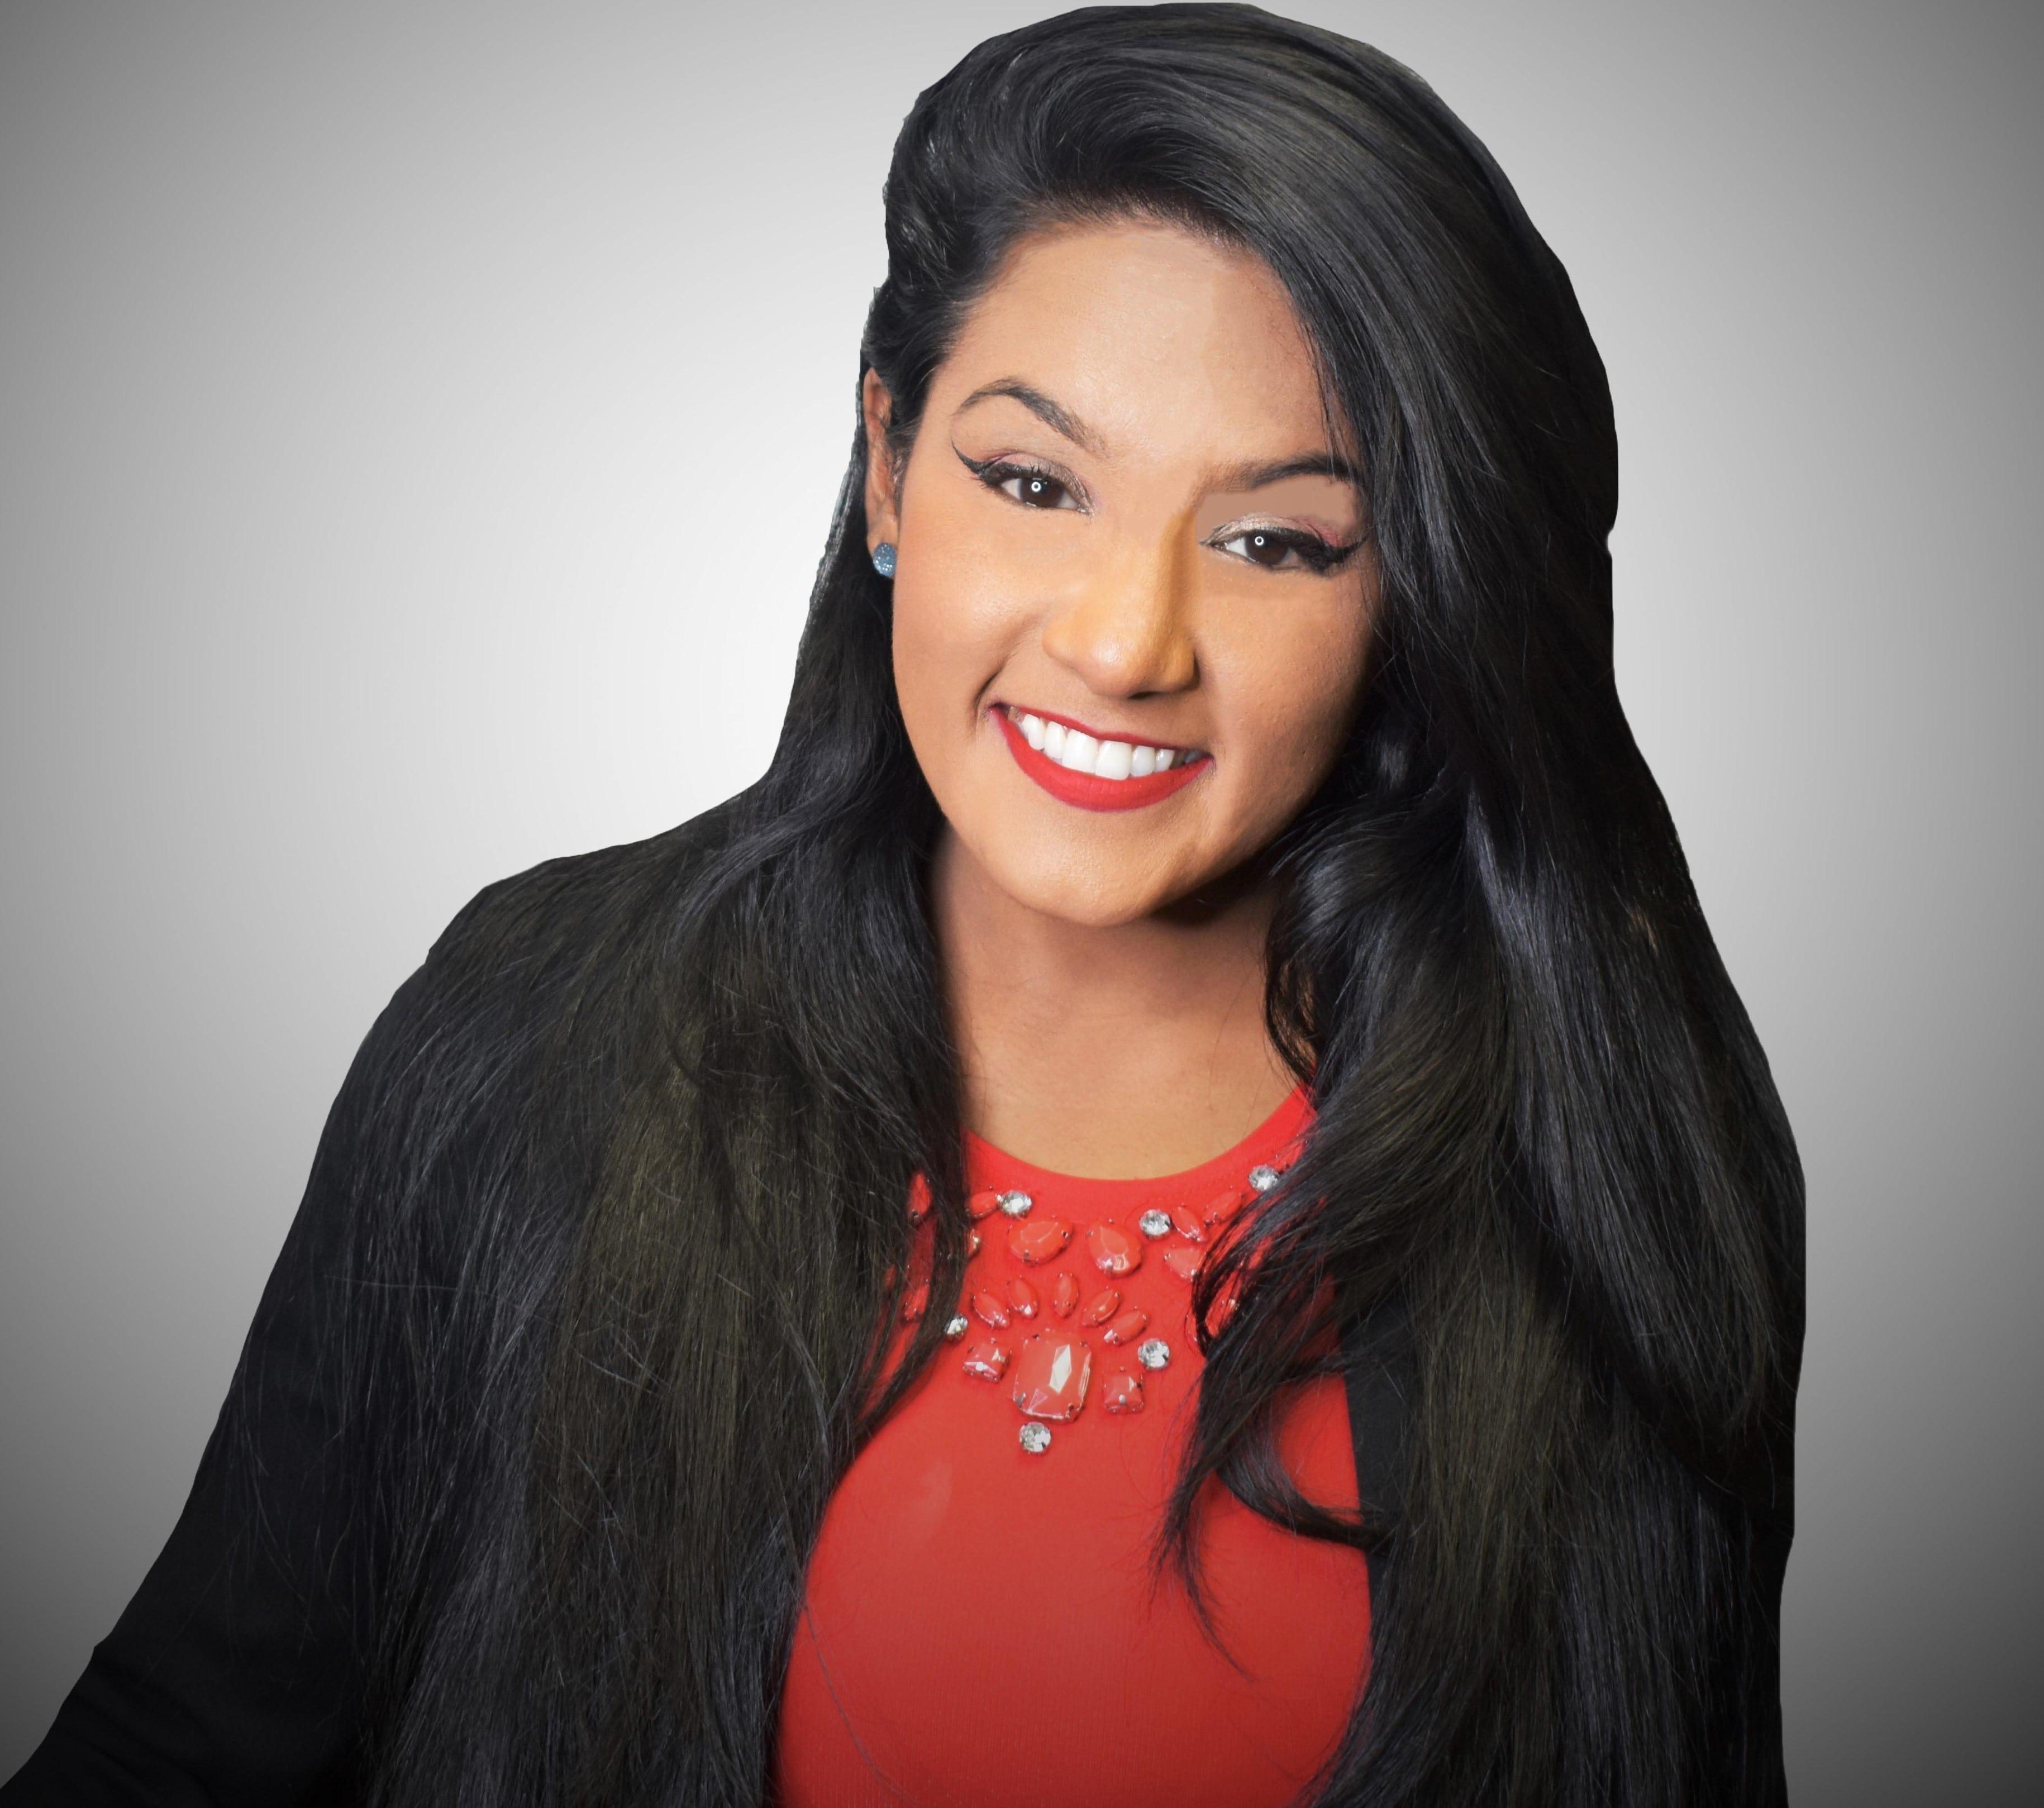 Alicia Munian